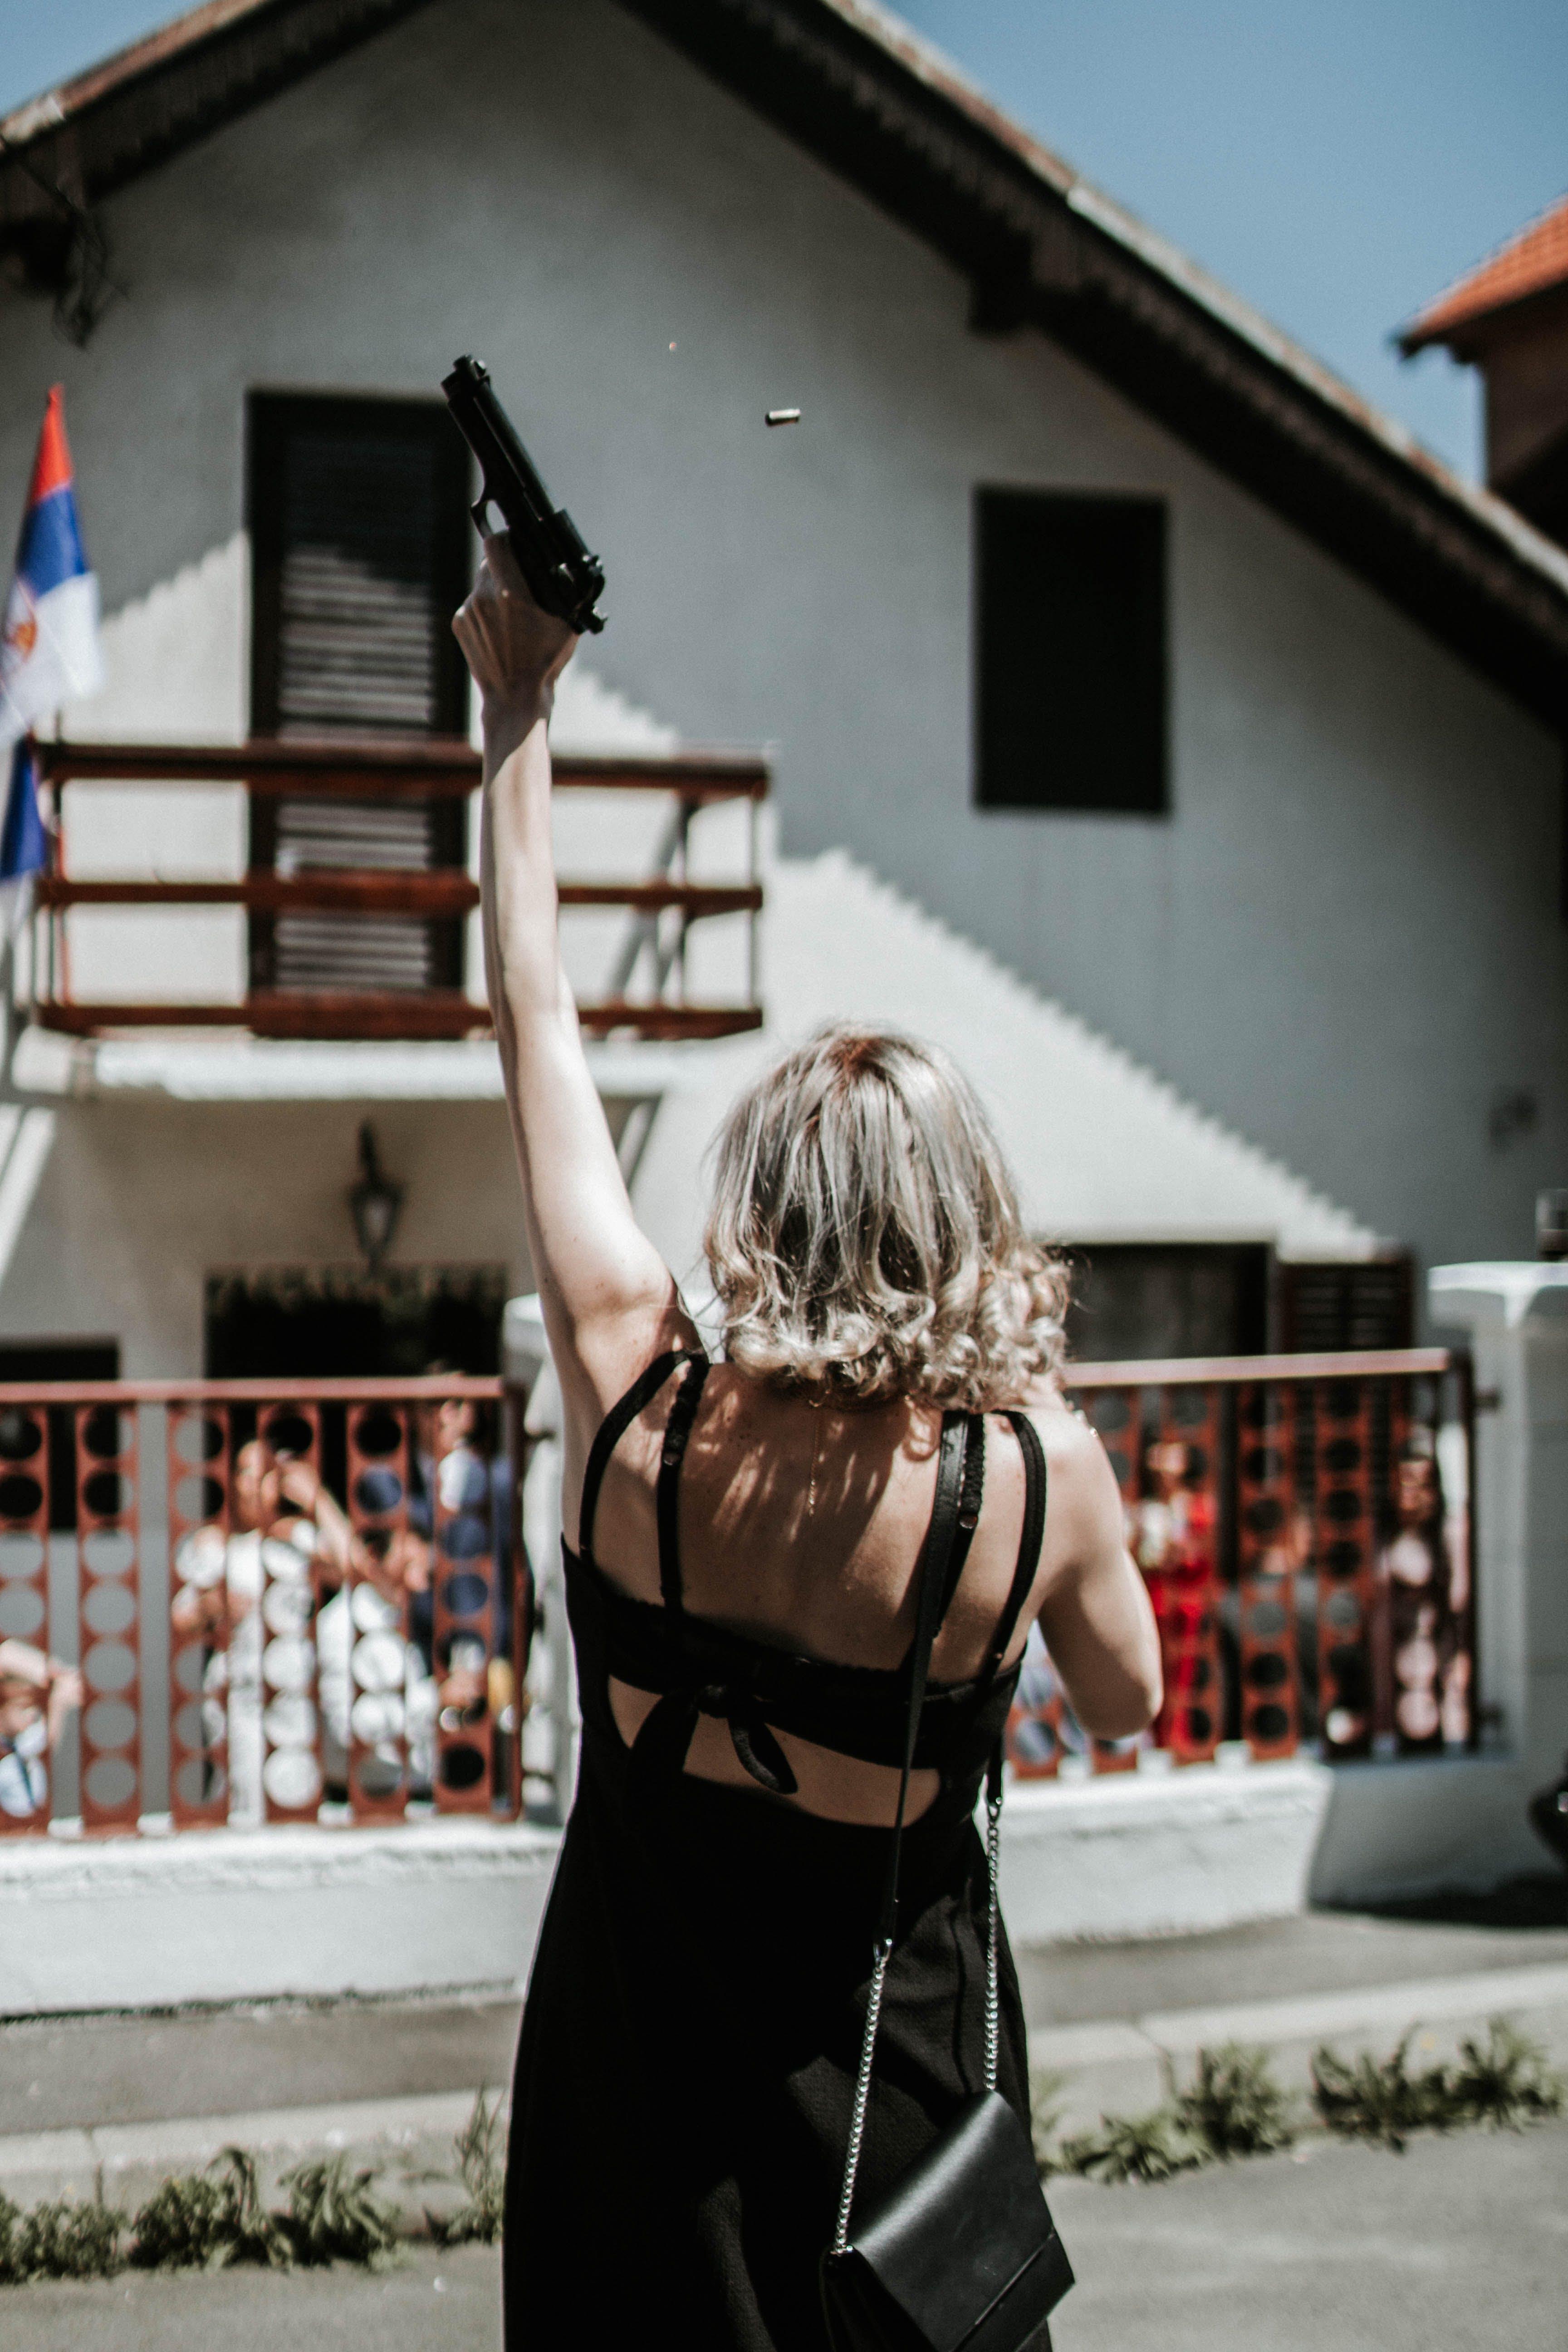 Woman In Black Mini Dress Holding Pistol